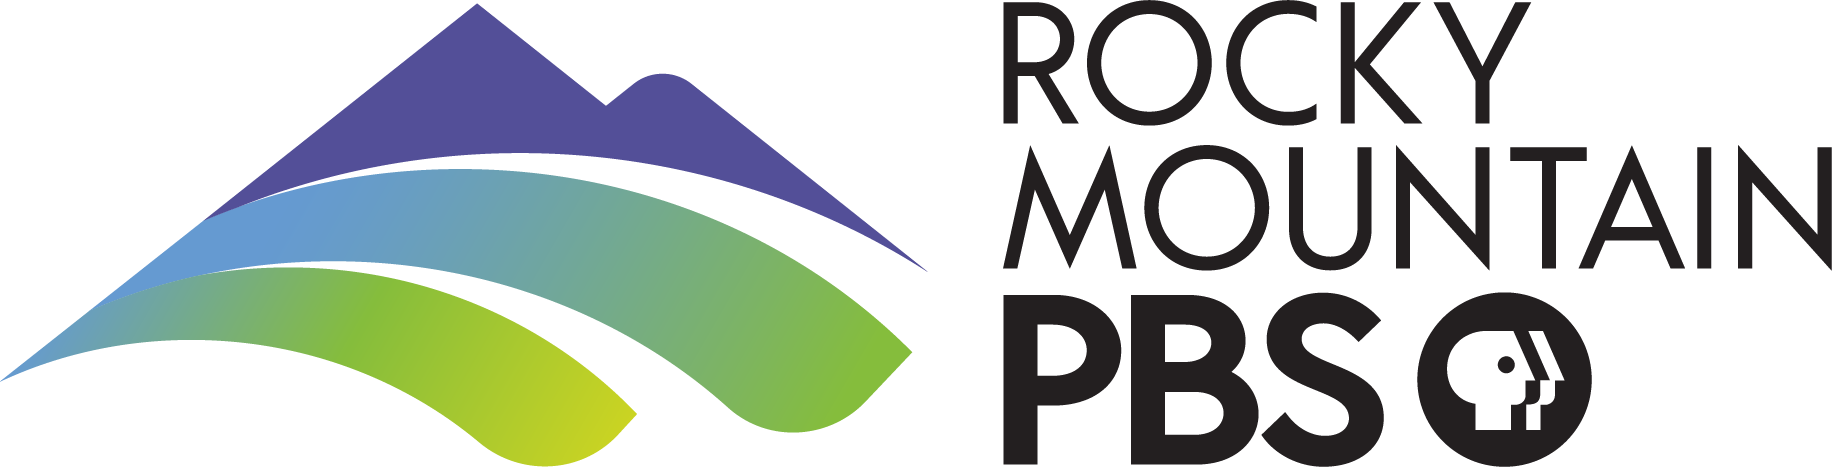 1832x467 Rmpbs Logos About Rocky Mountain Pbs Rocky Mountain Pbs